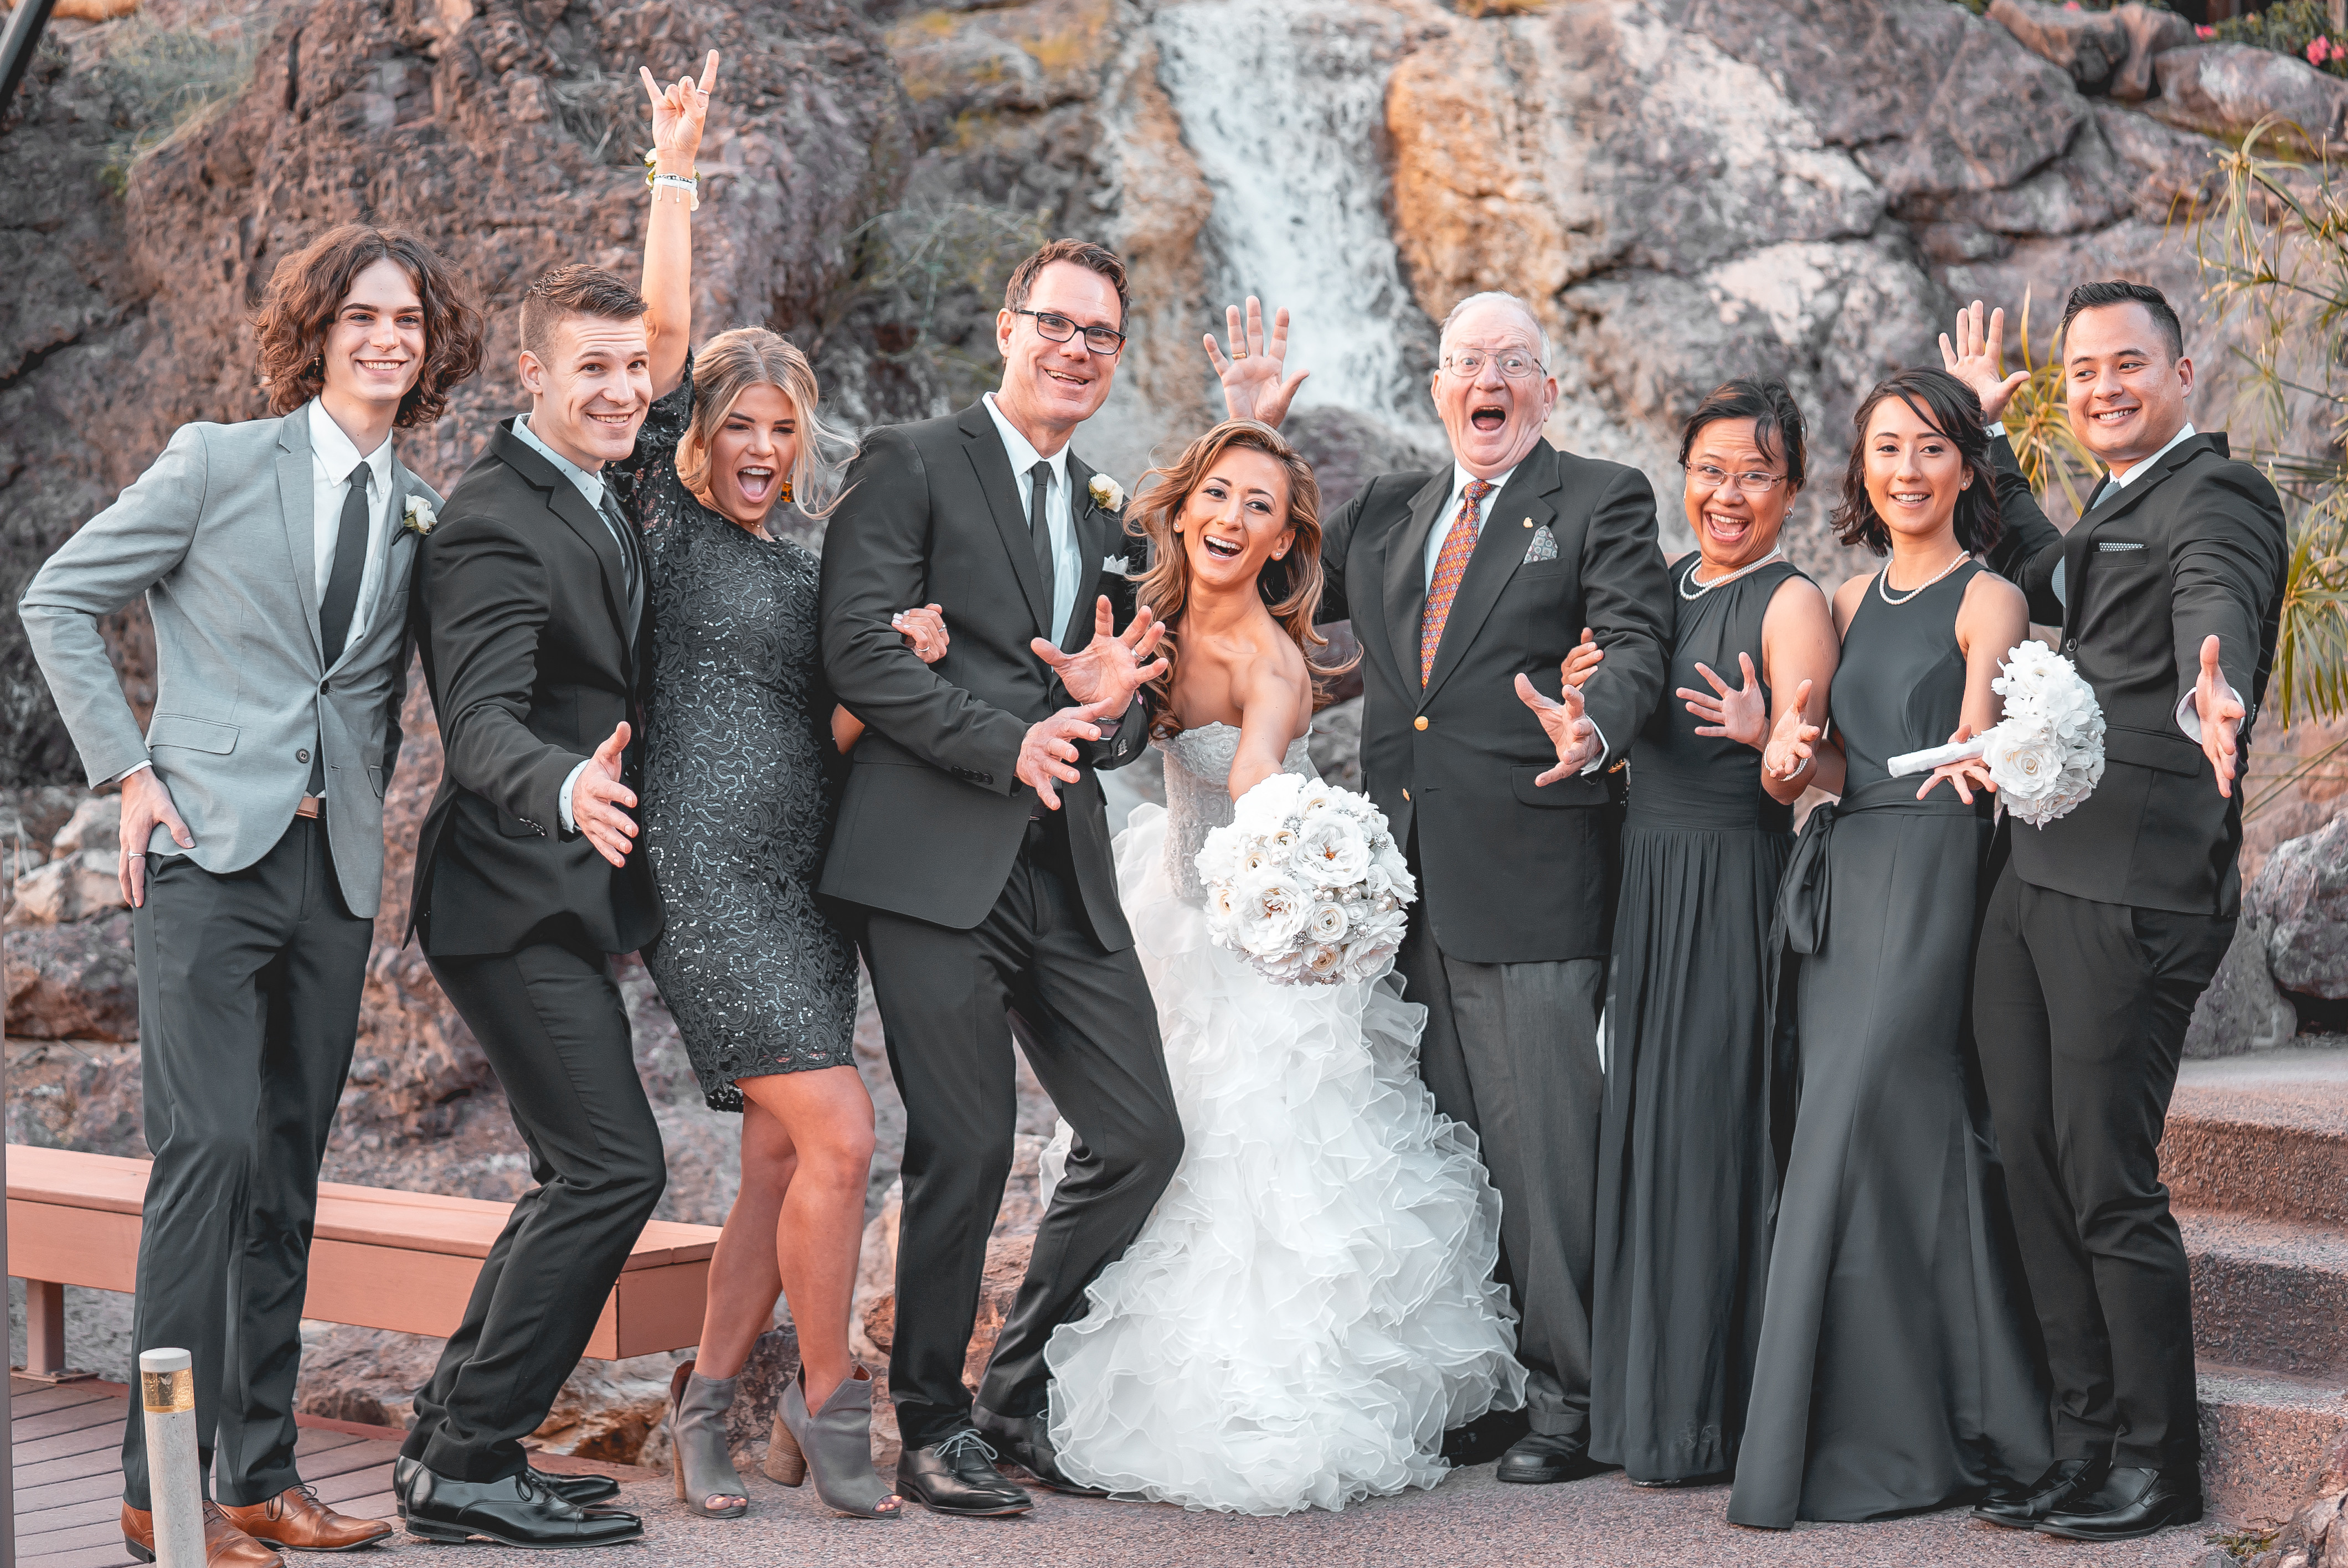 WEDDING ALL-IN-ONE BUNDLE